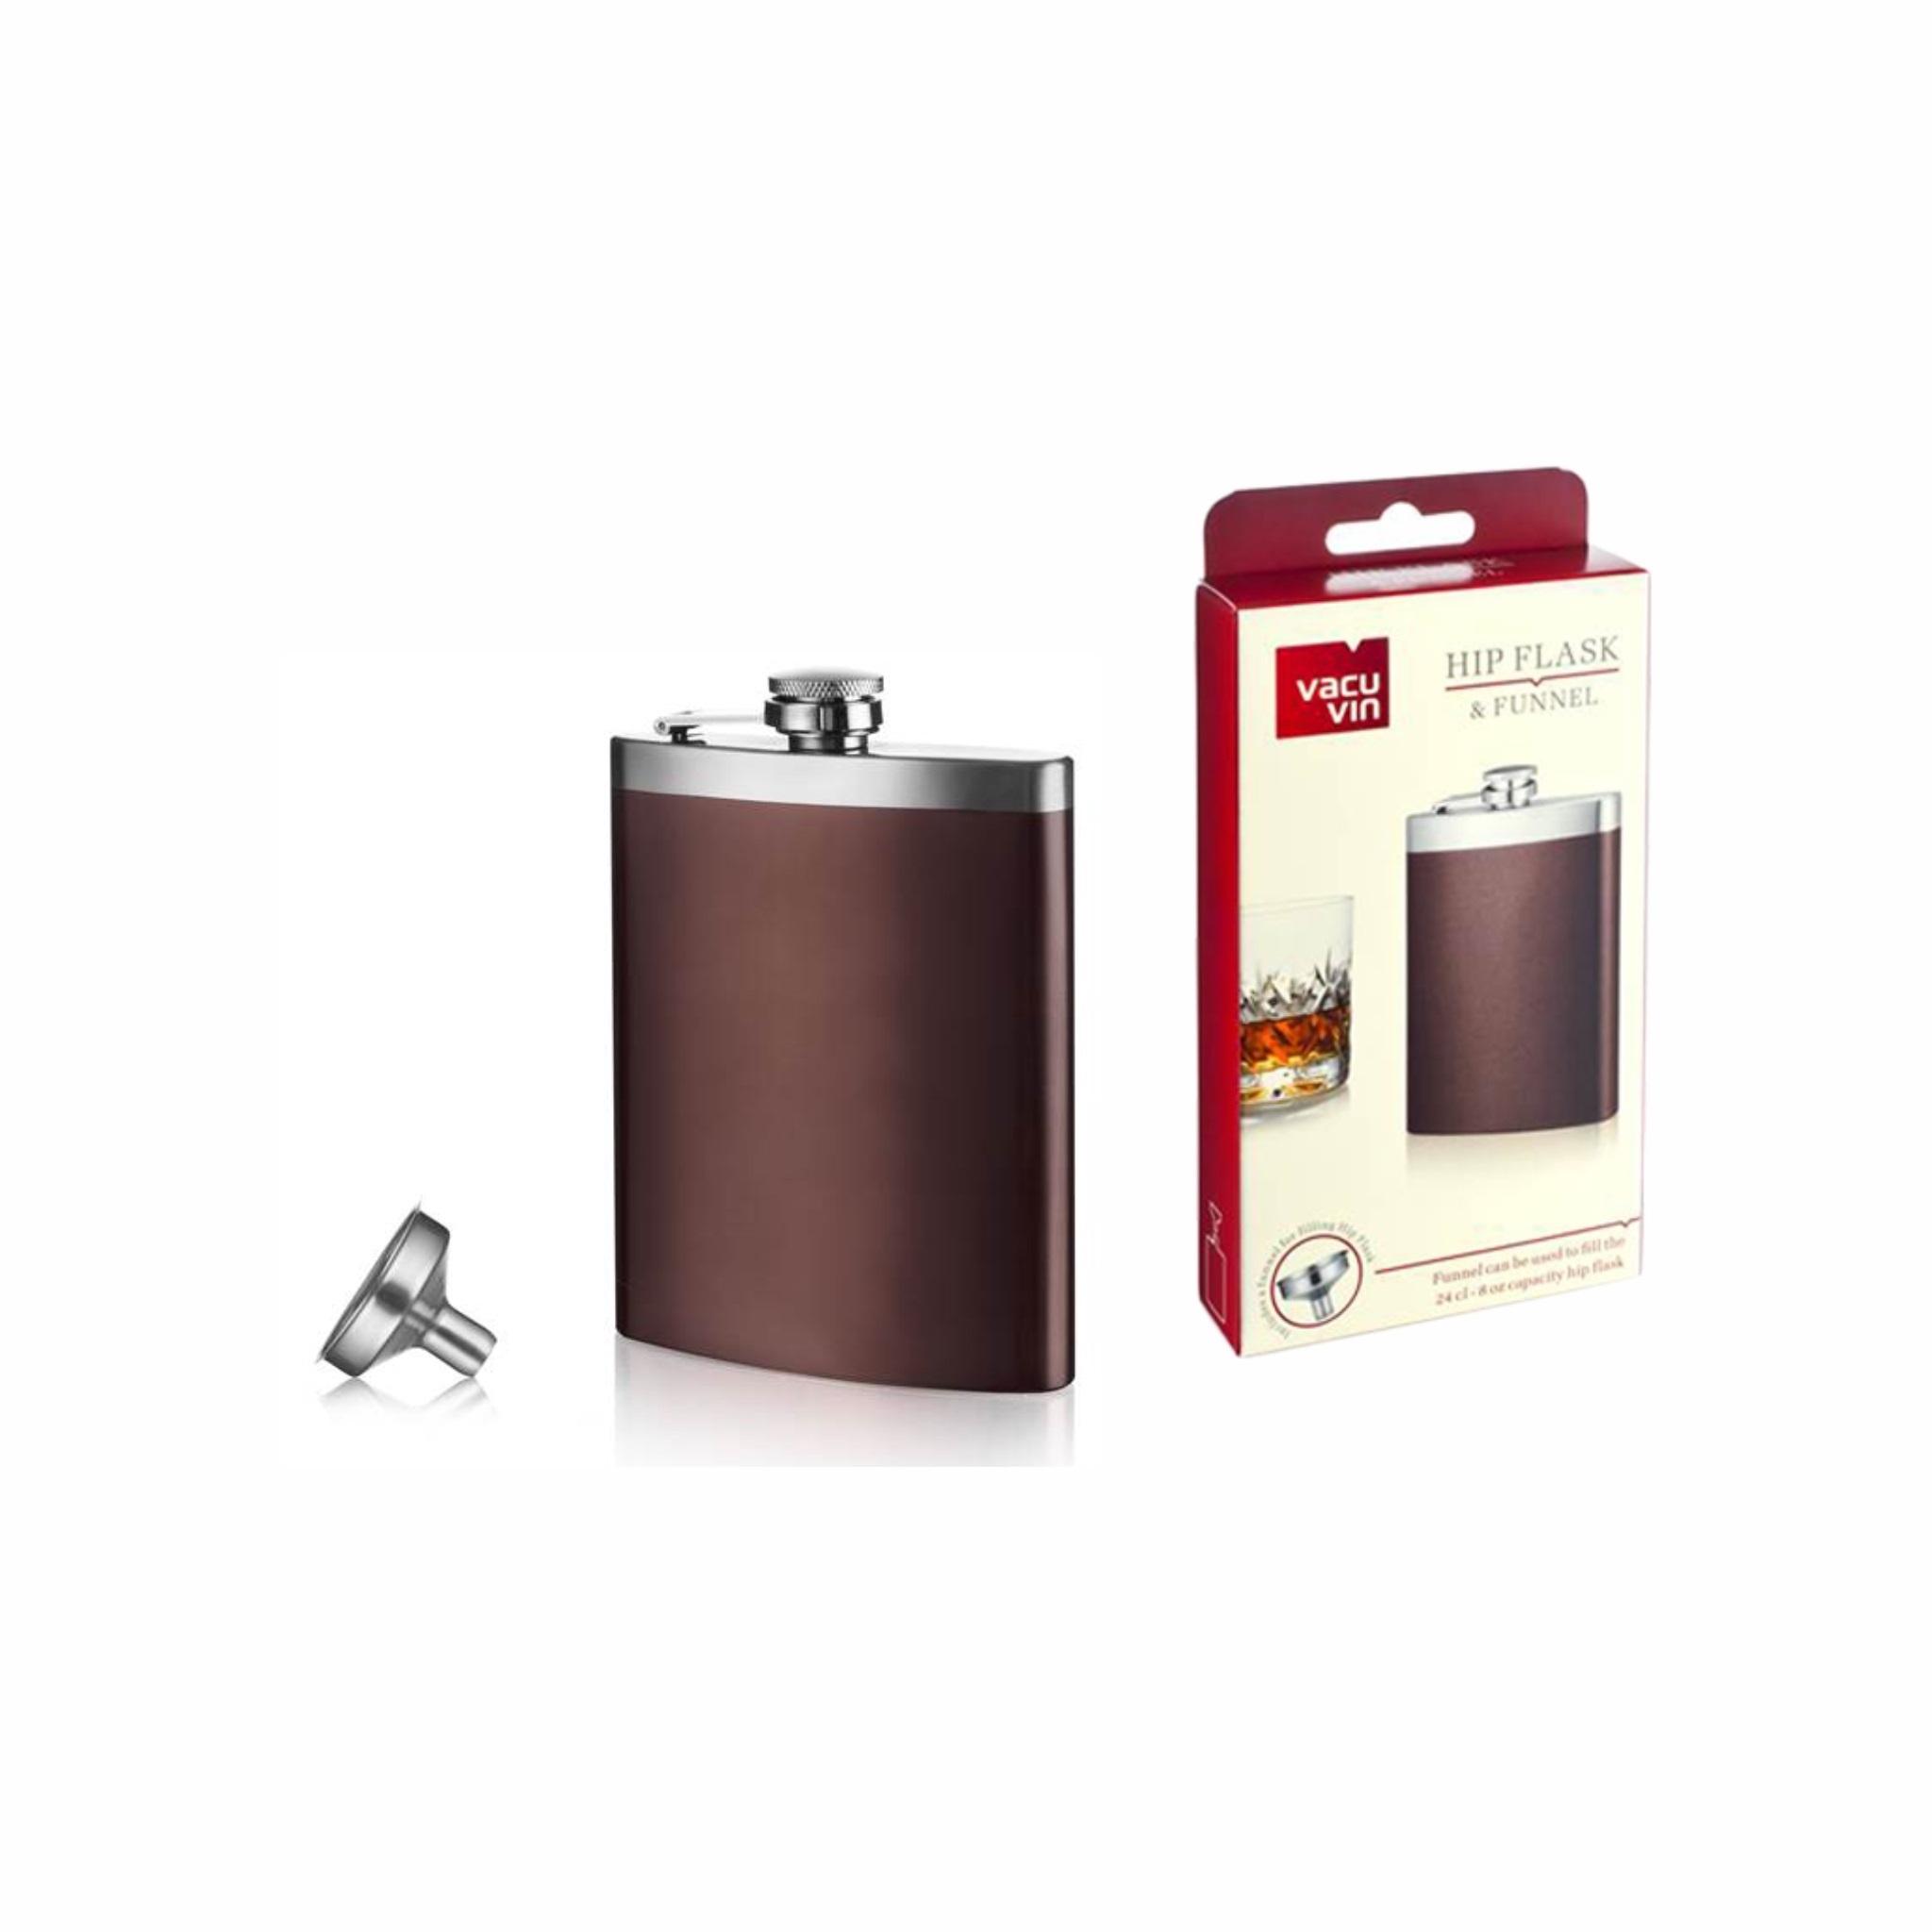 Vacu Vin Hip Flask & Funnel 240ml